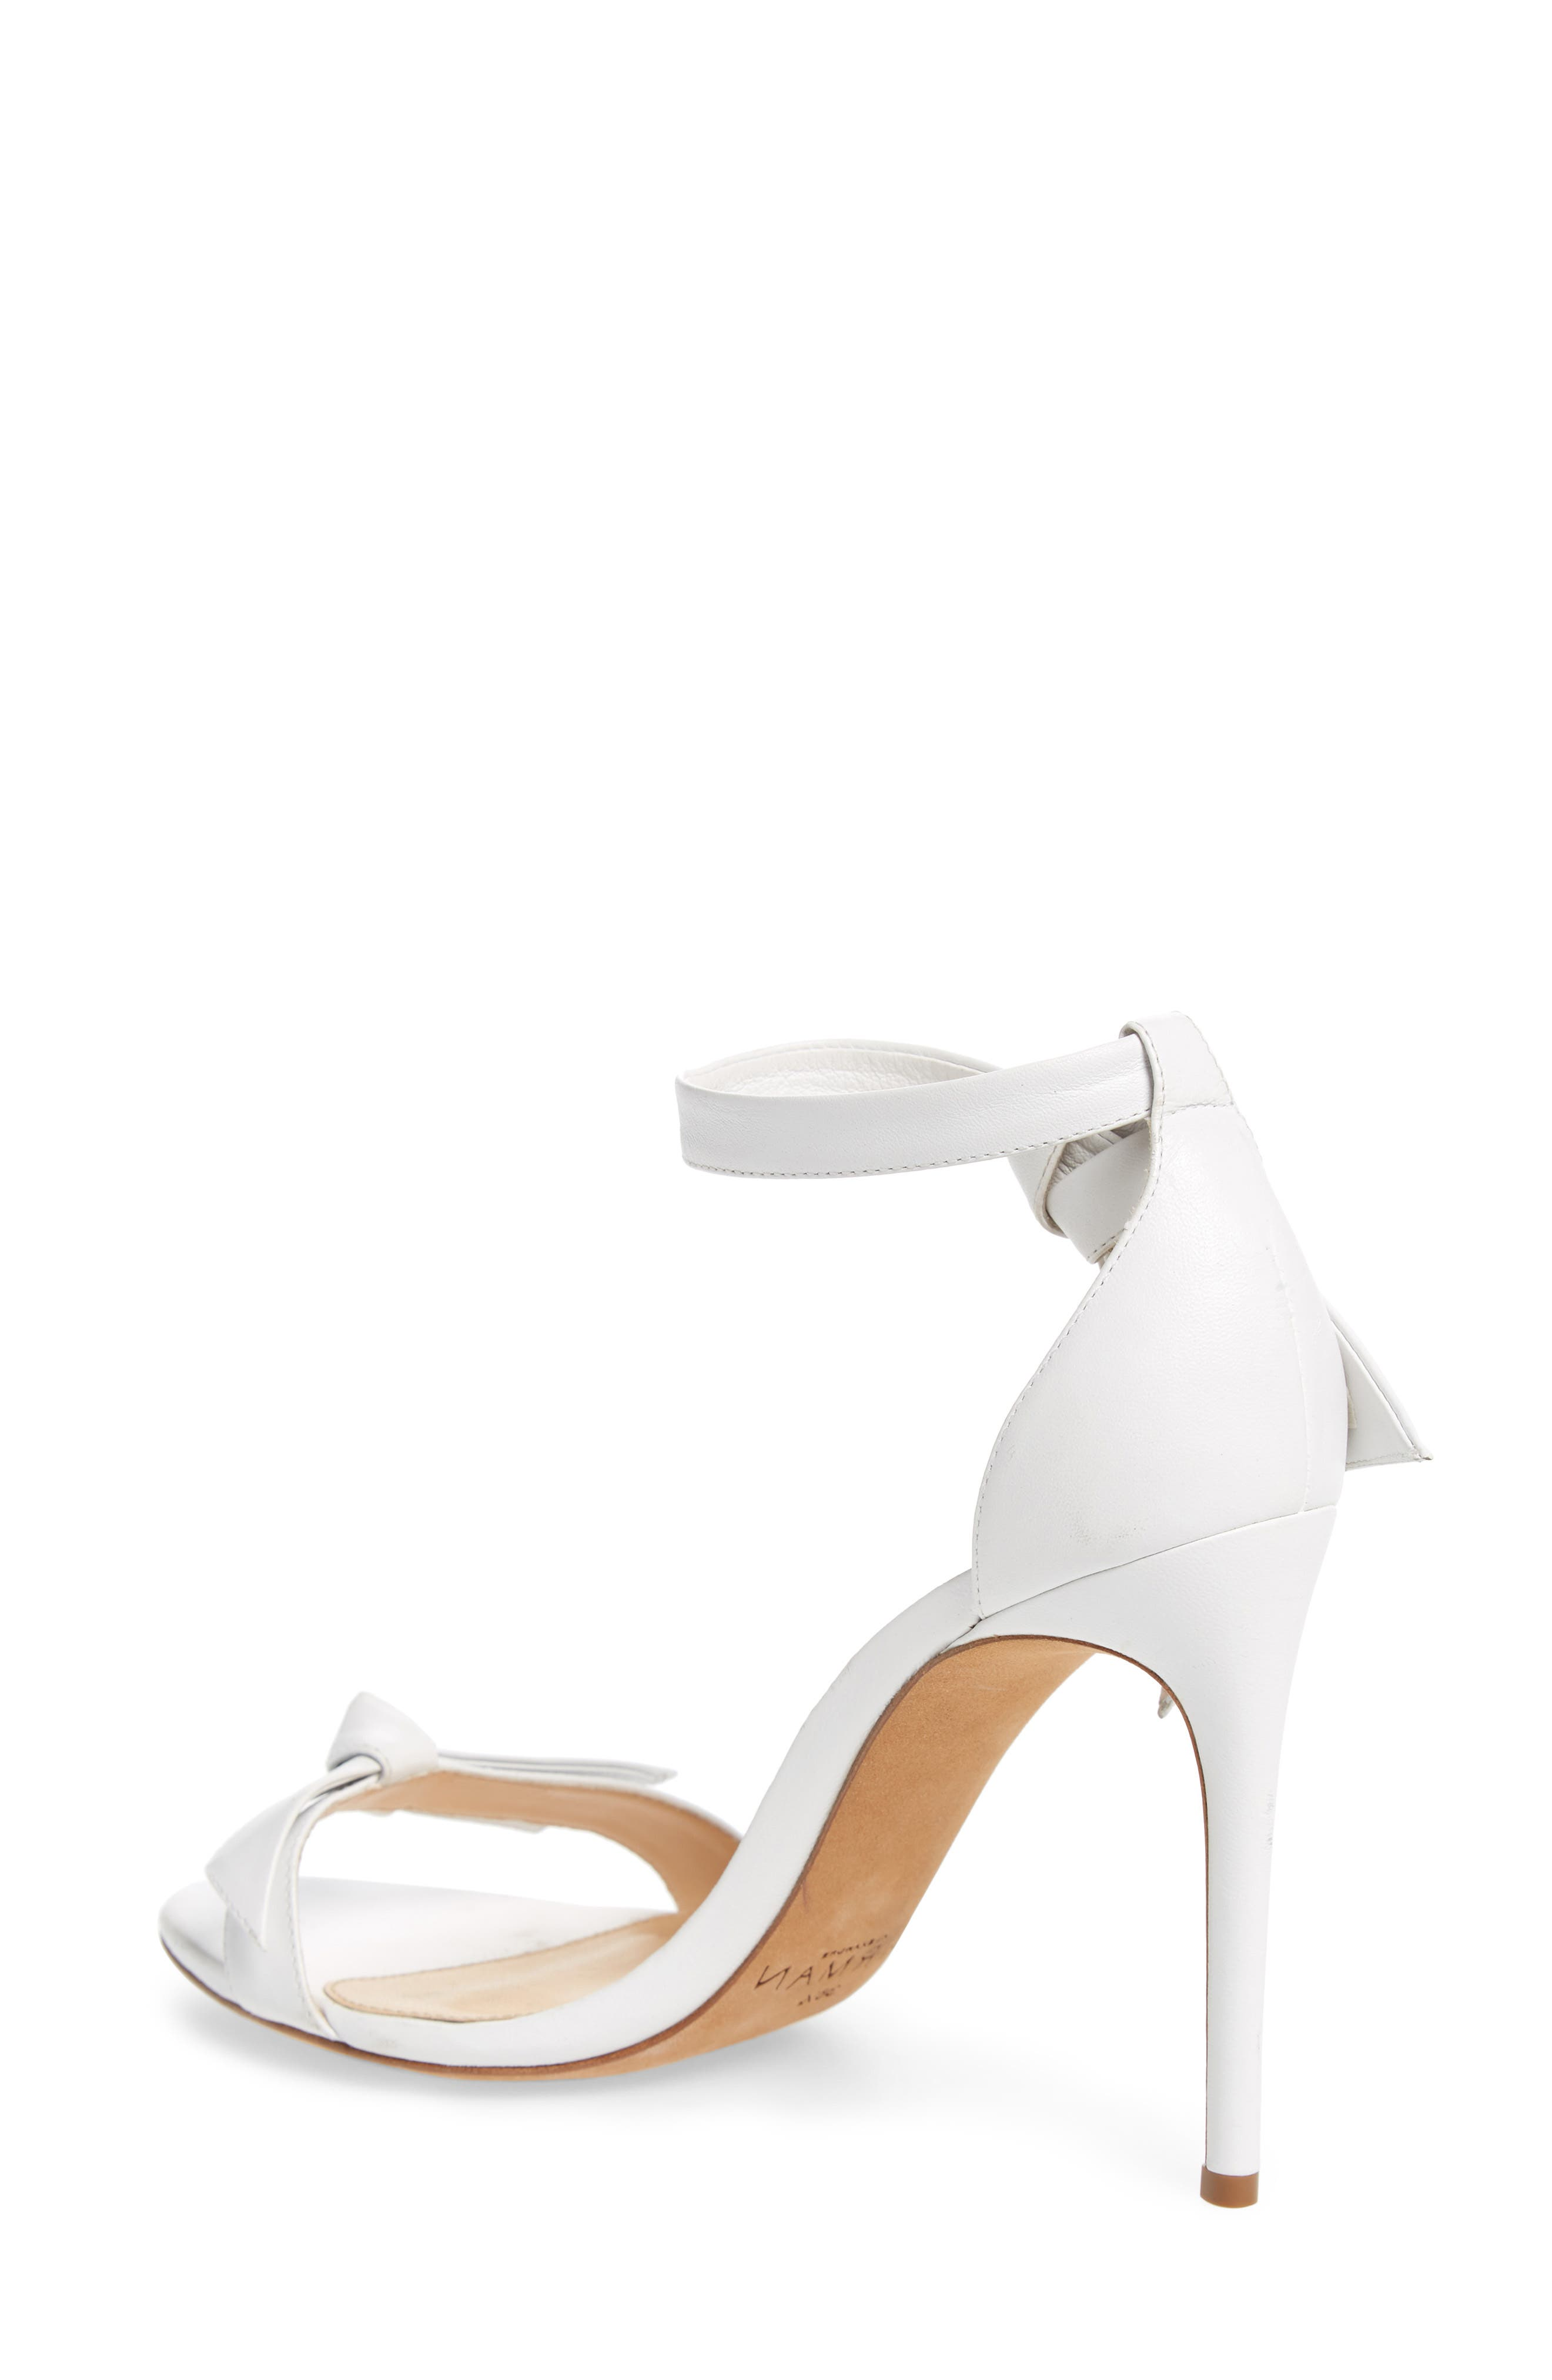 Alternate Image 2  - Alexandre Birman 'Clarita' Ankle Tie Sandal (Women)